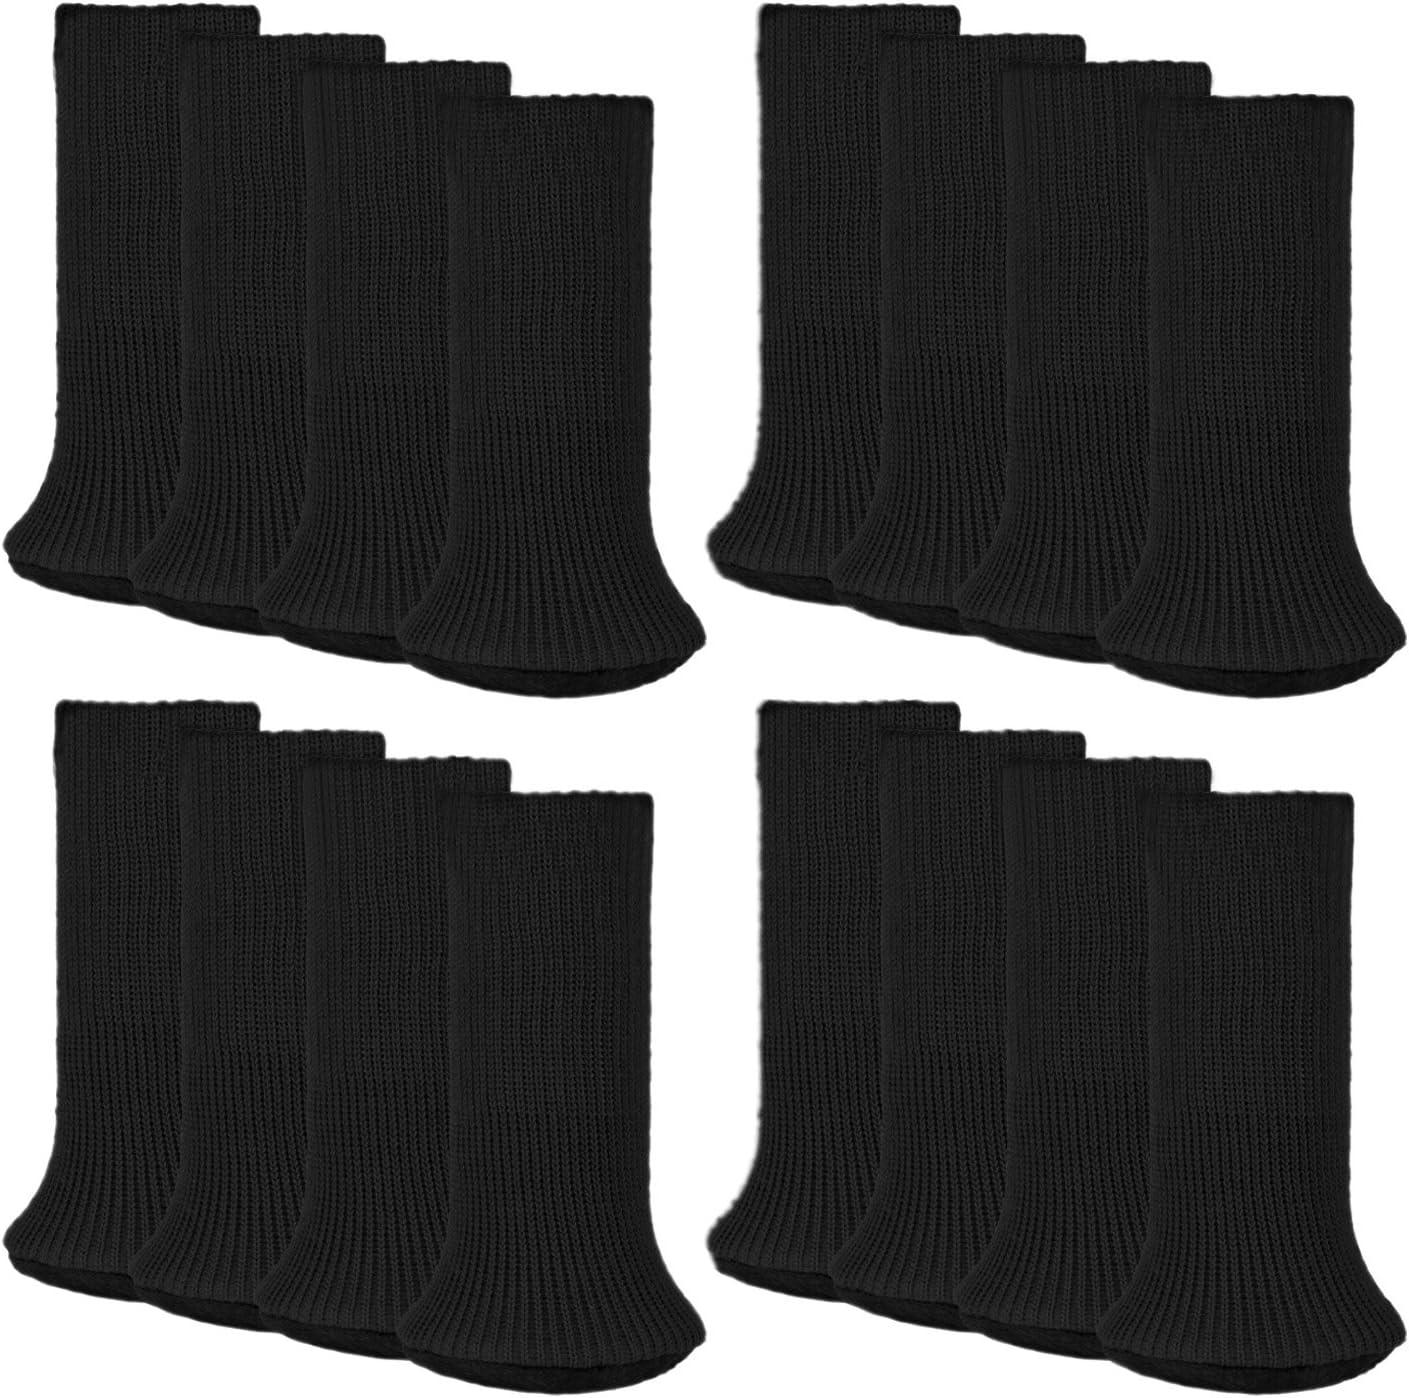 Outgeek Furniture Socks 16 Pcs Chair Leg Socks Anti-Skid Wool Knitted Chair Leg Floor Protector Thick Bottom Furniture Leg Covers (Black)